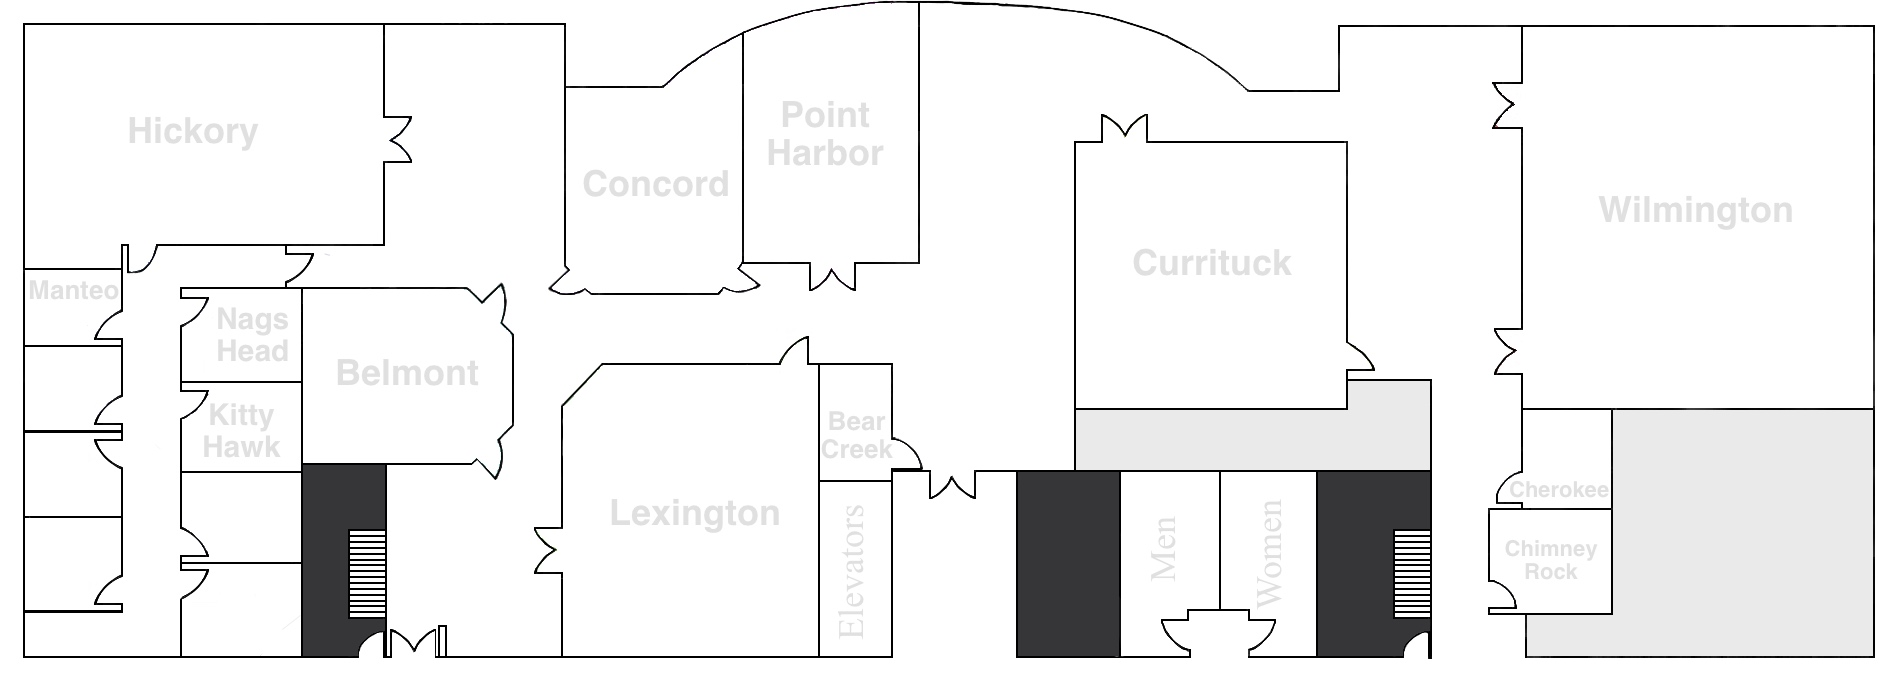 Floorplan Planing Document.jpg